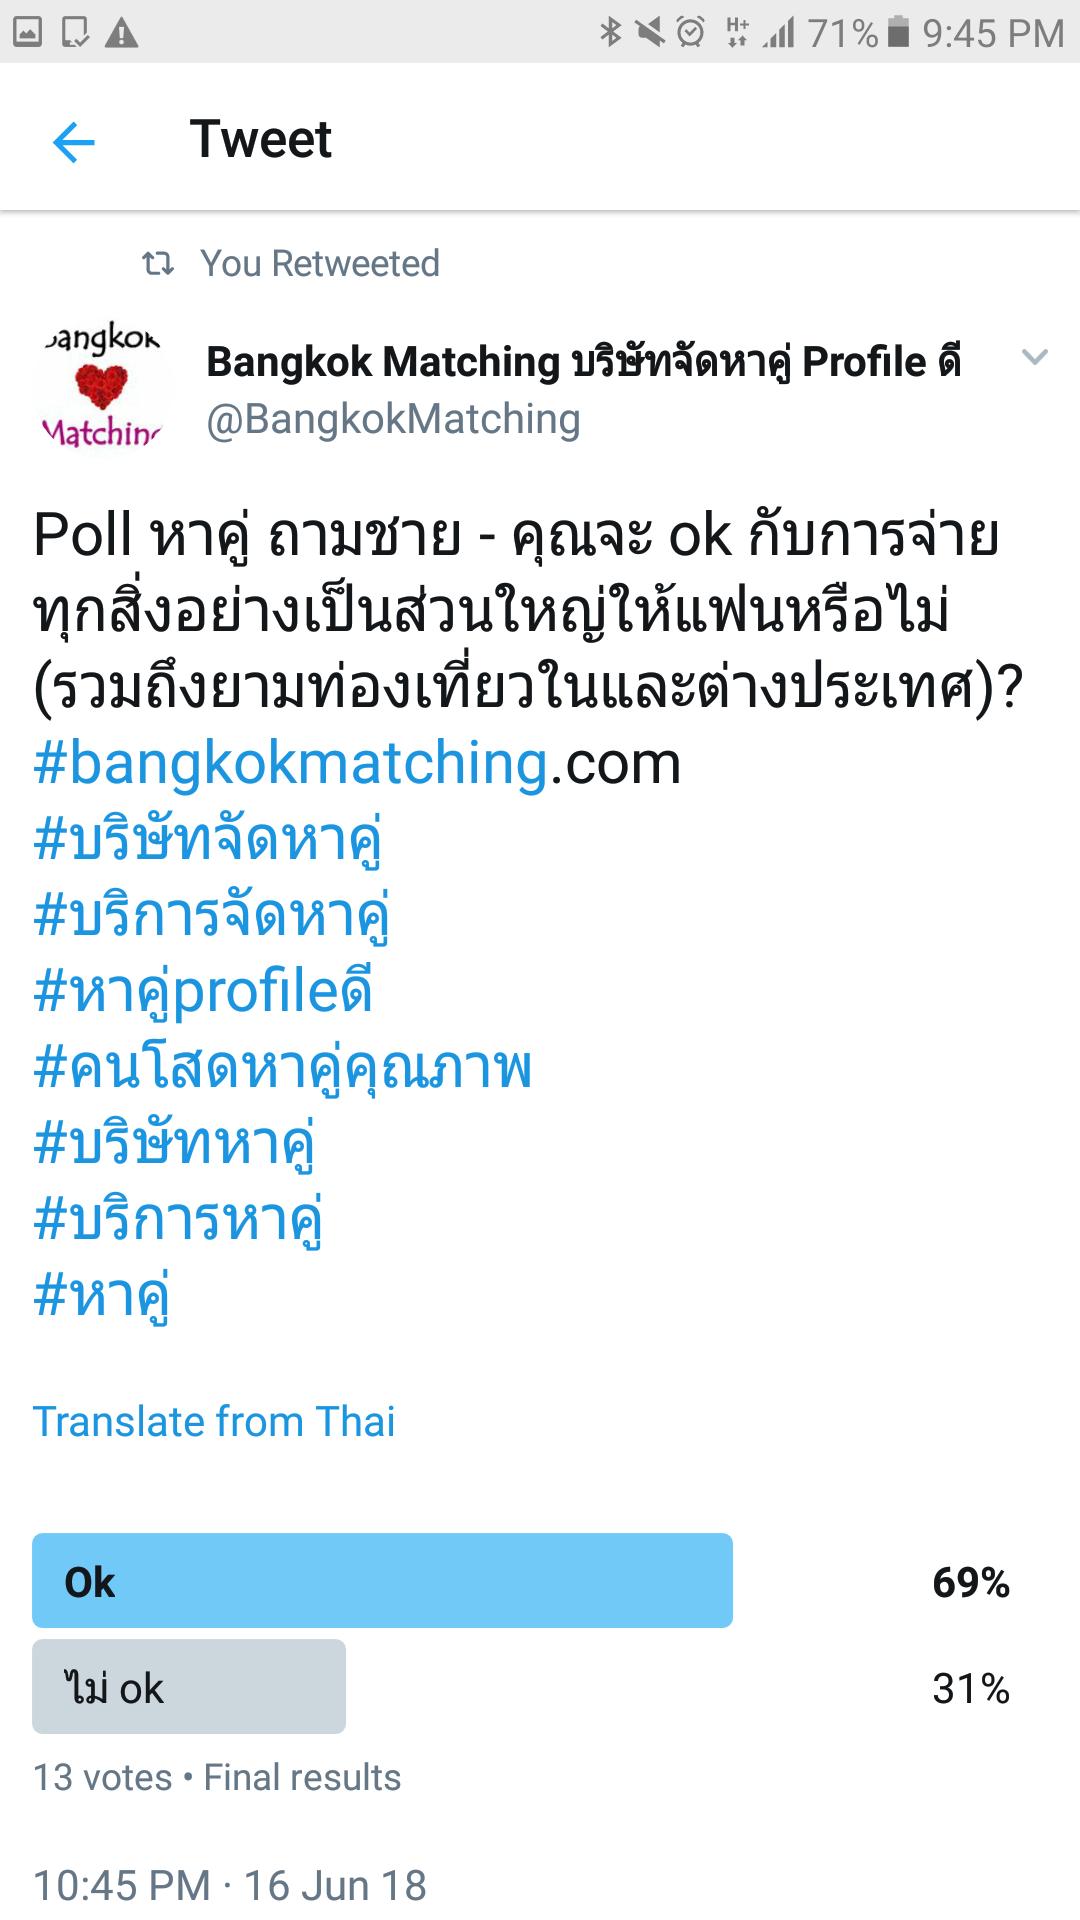 matchmaking translate